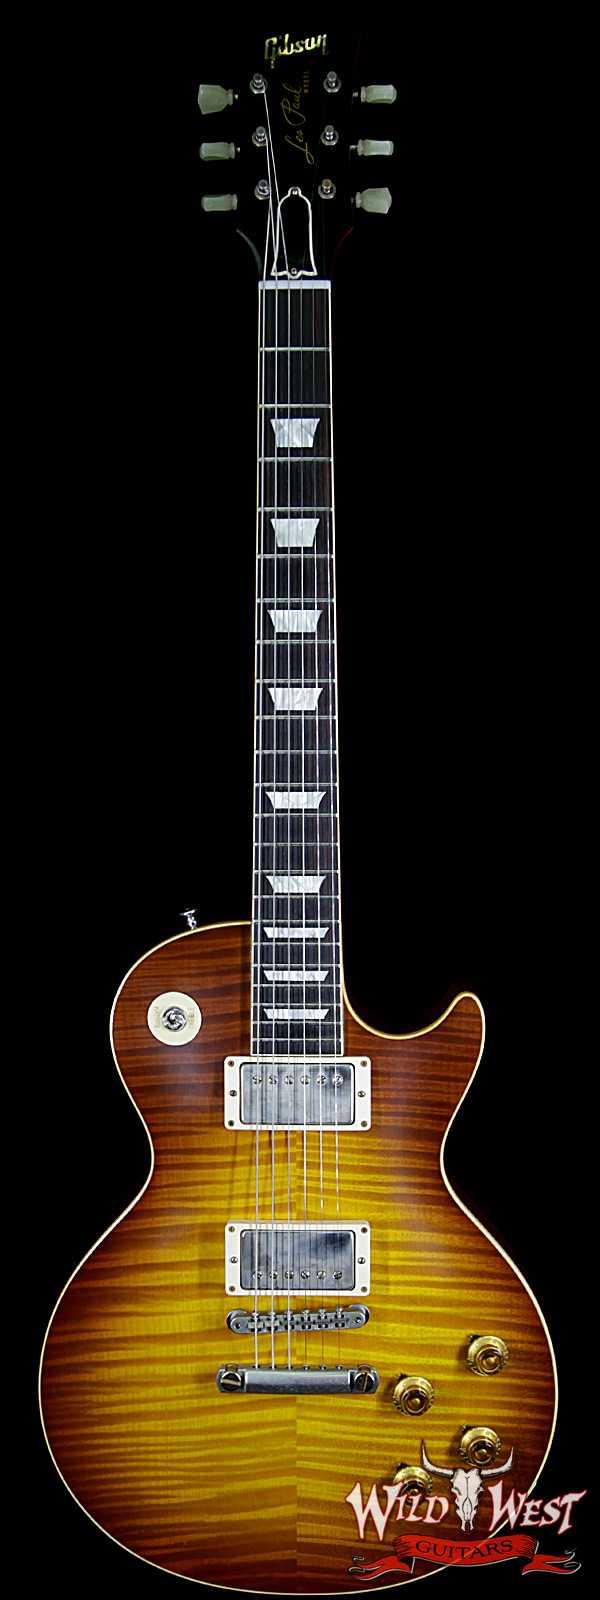 Gibson Custom Shop Historic 1959 Les Paul R9 VOS Hand Selected Killer Top Brazilian Rosewood Board Royal Teaburst 9.0 LBS